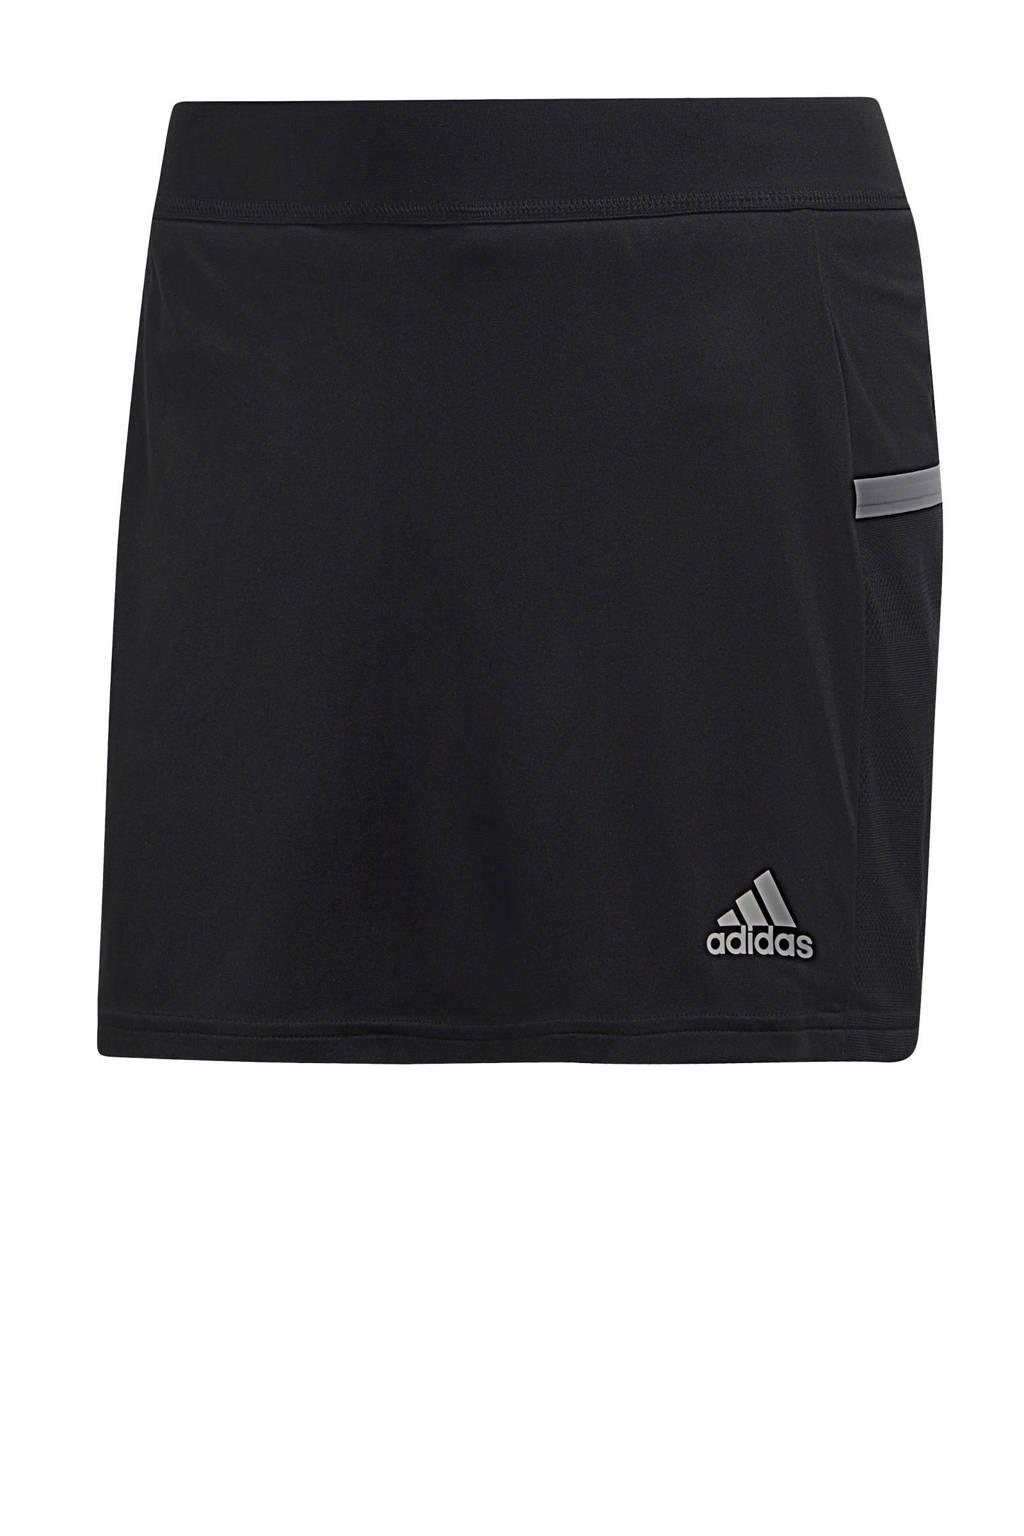 adidas Performance sportrokje T19 zwart, Zwart